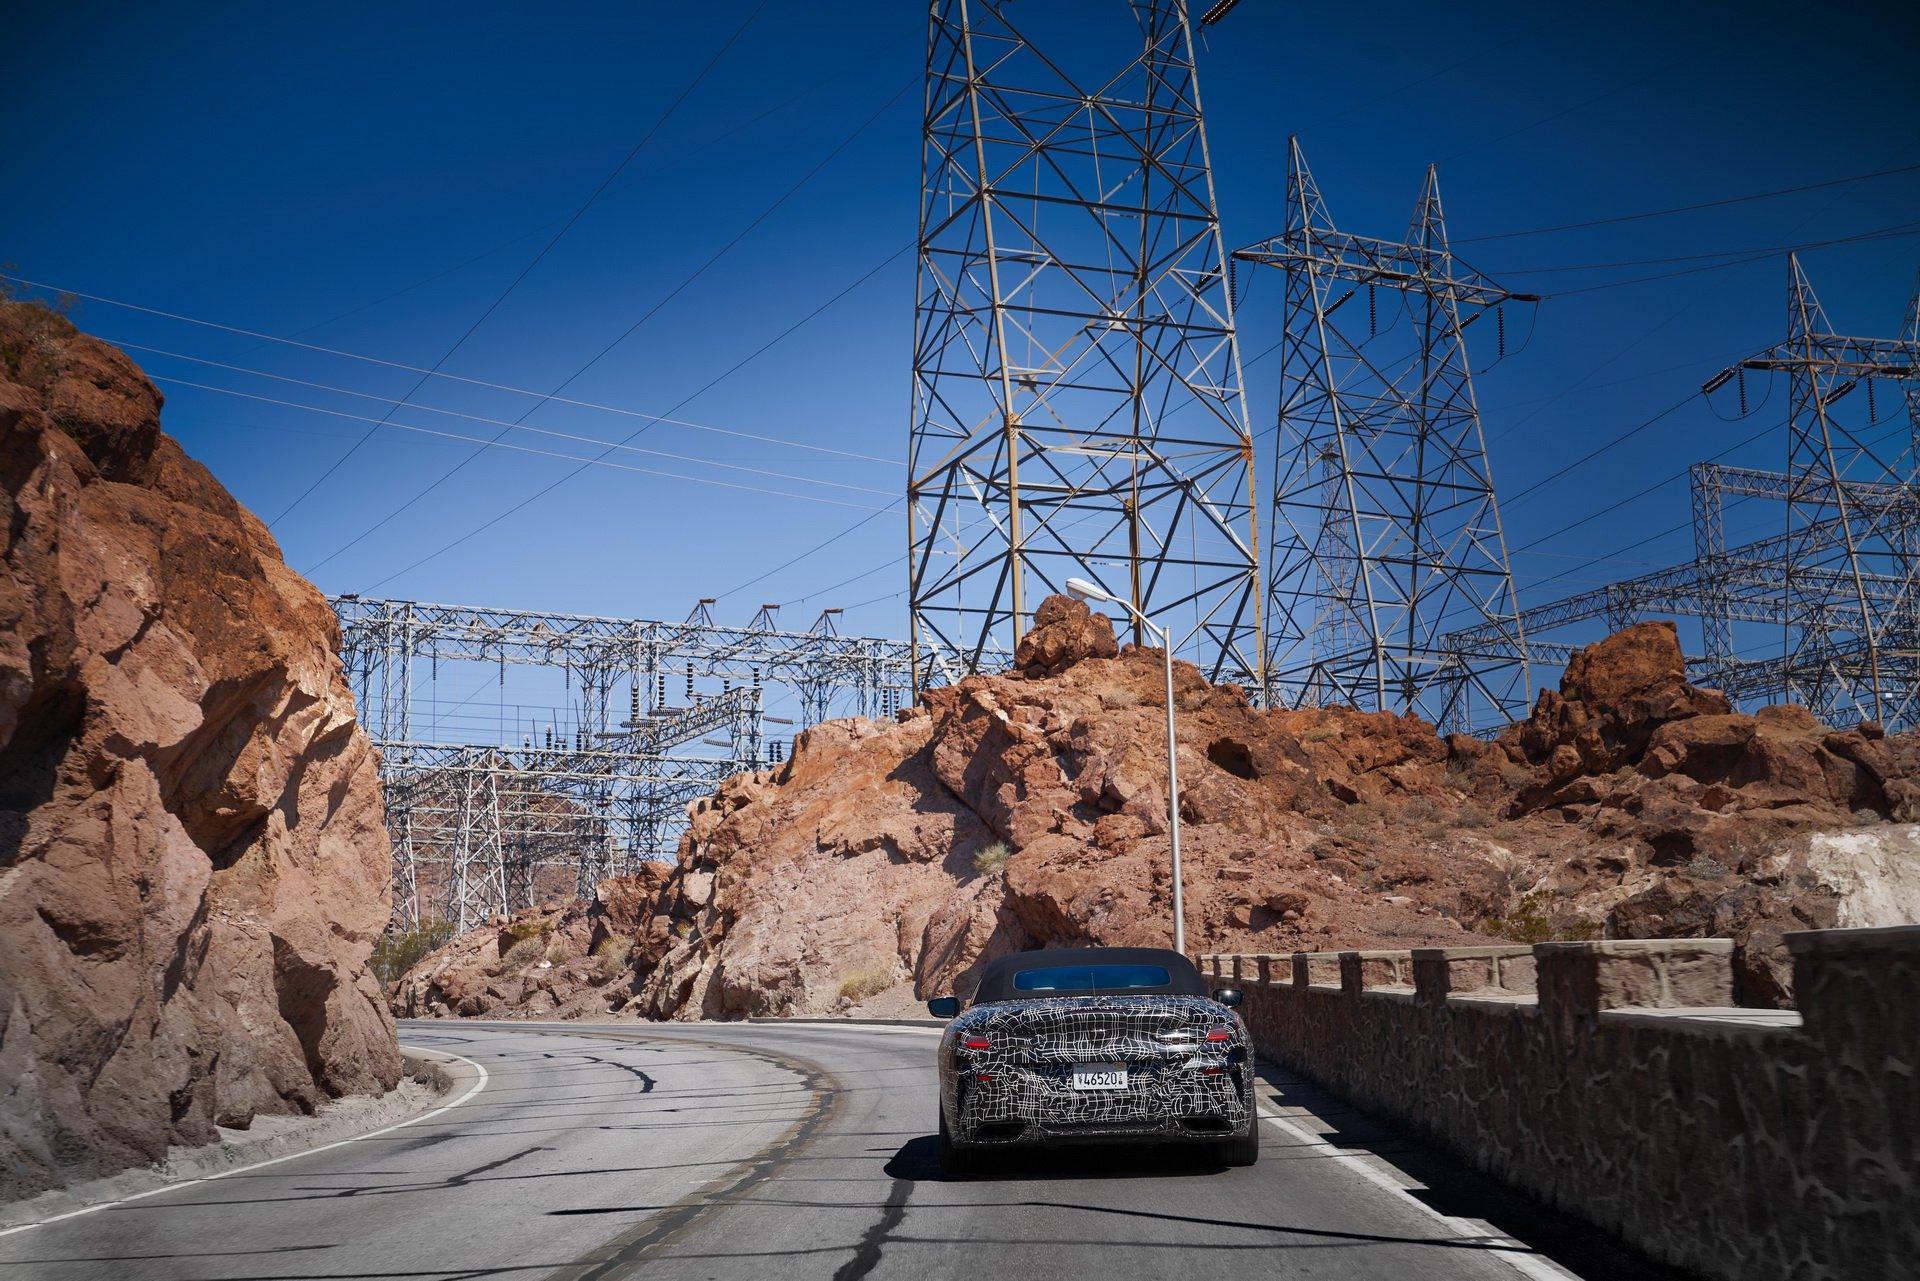 d1fe5437-bmw-8-series-cabrio-prototype-desert-tests-2